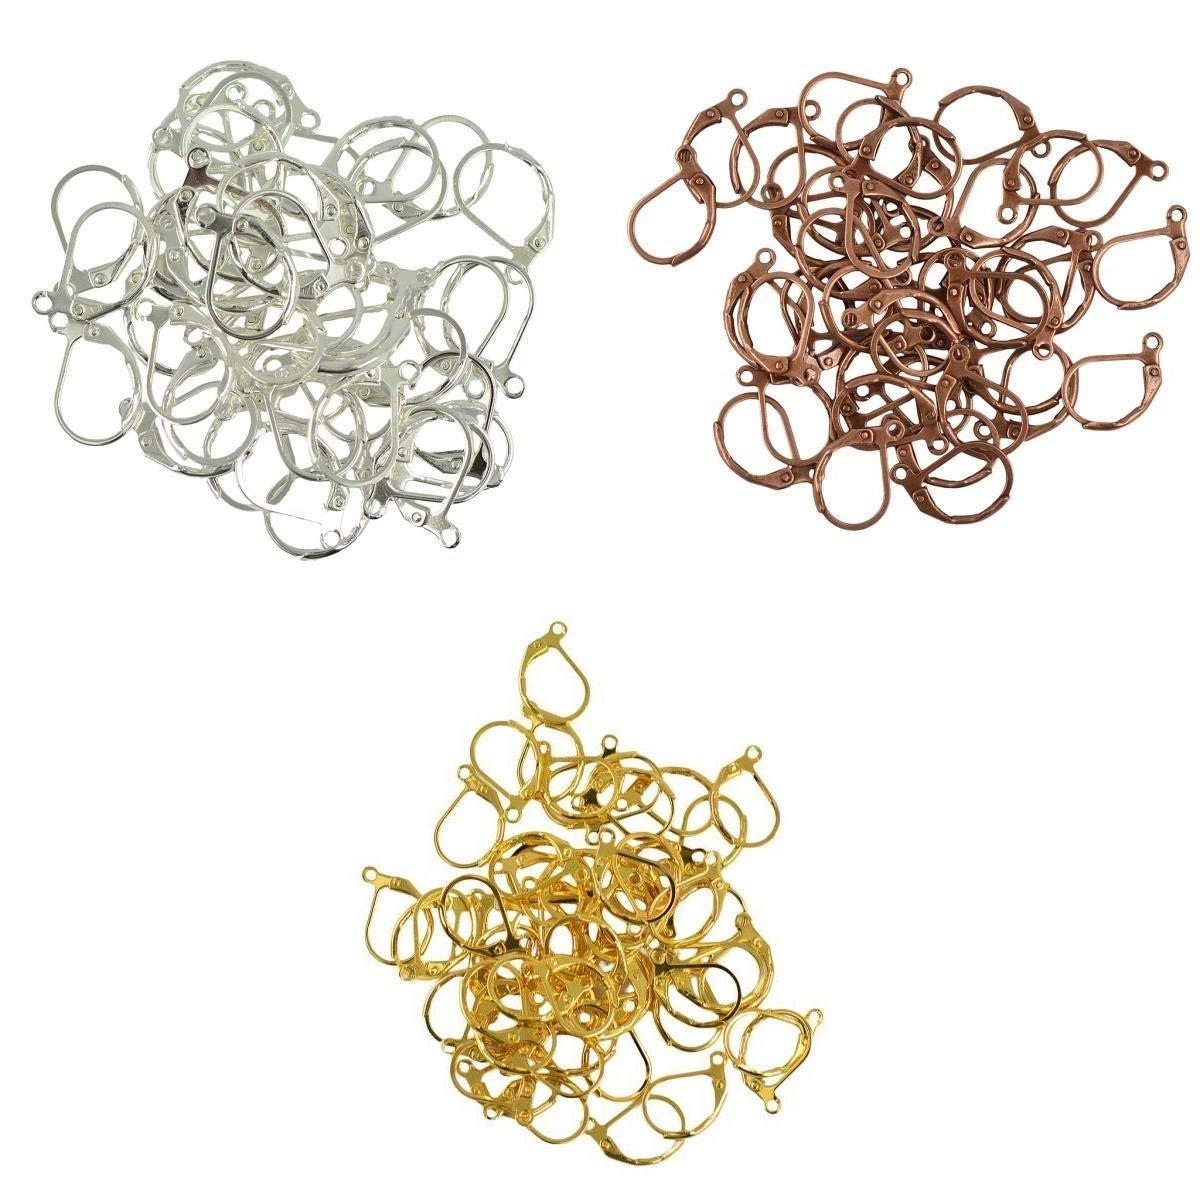 10 Pairs Genuine Copper Earring Hooks Kidney Wire 47.5mm